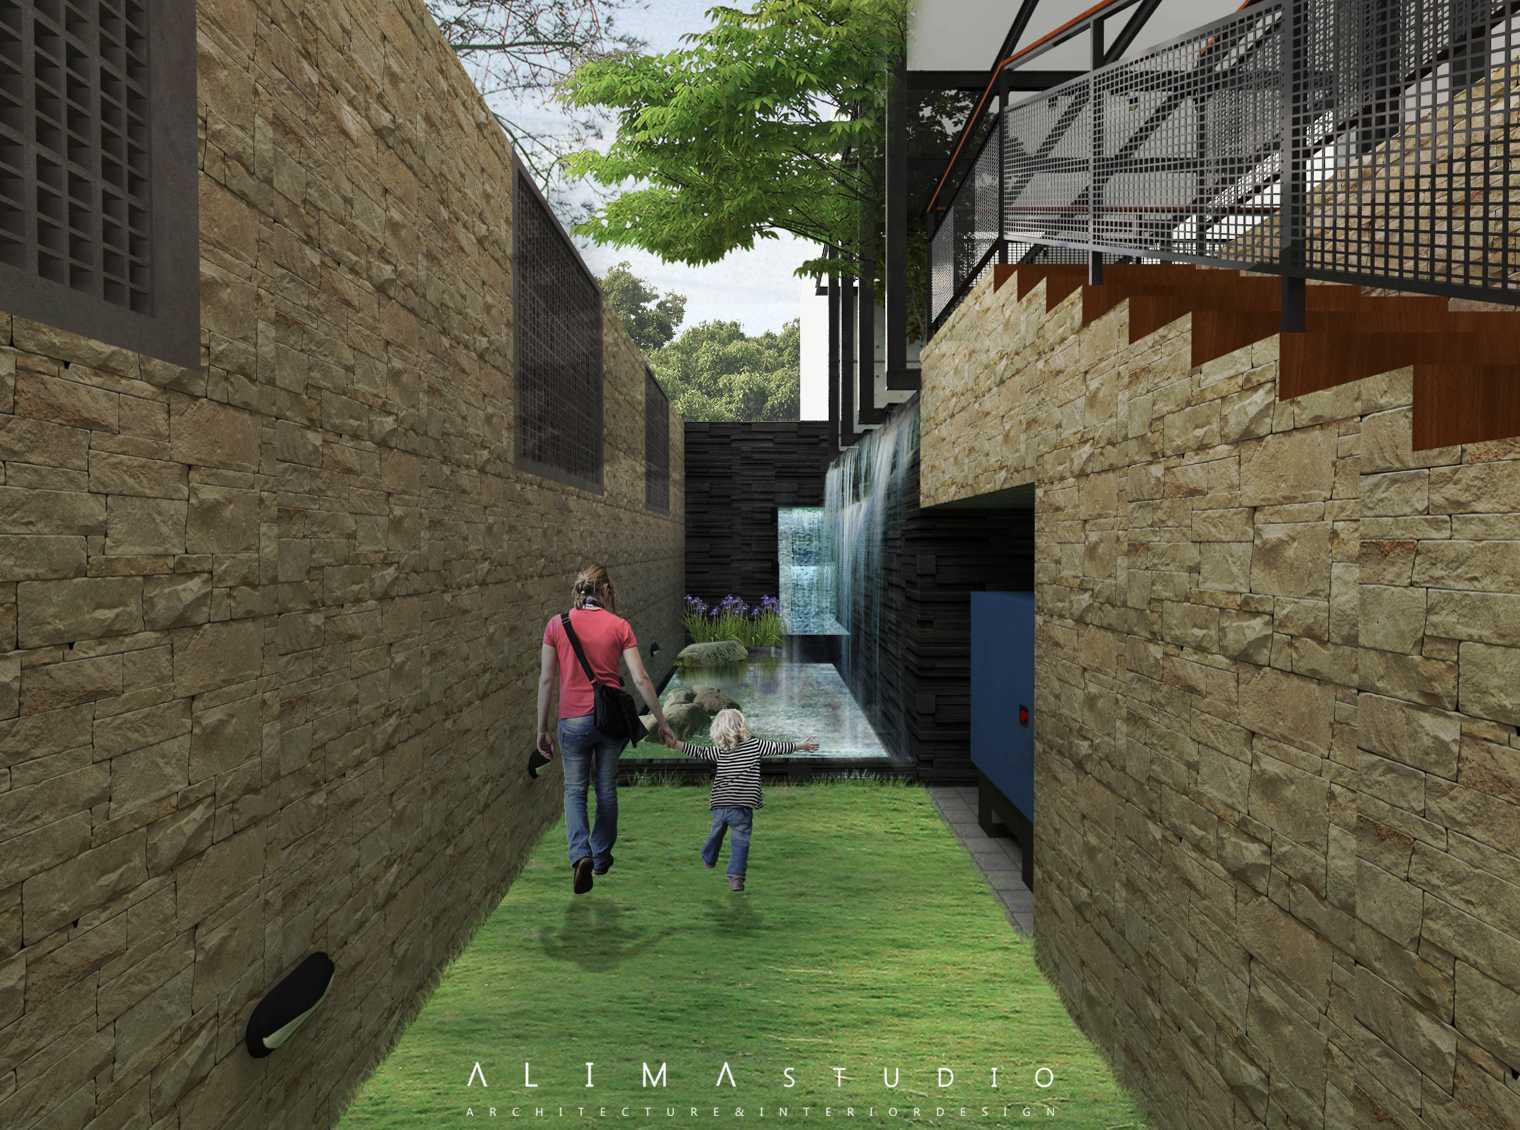 Alima Studio Sa House Makassar, Kota Makassar, Sulawesi Selatan, Indonesia Makassar, Kota Makassar, Sulawesi Selatan, Indonesia Alima-Studio-Sa-House  66970